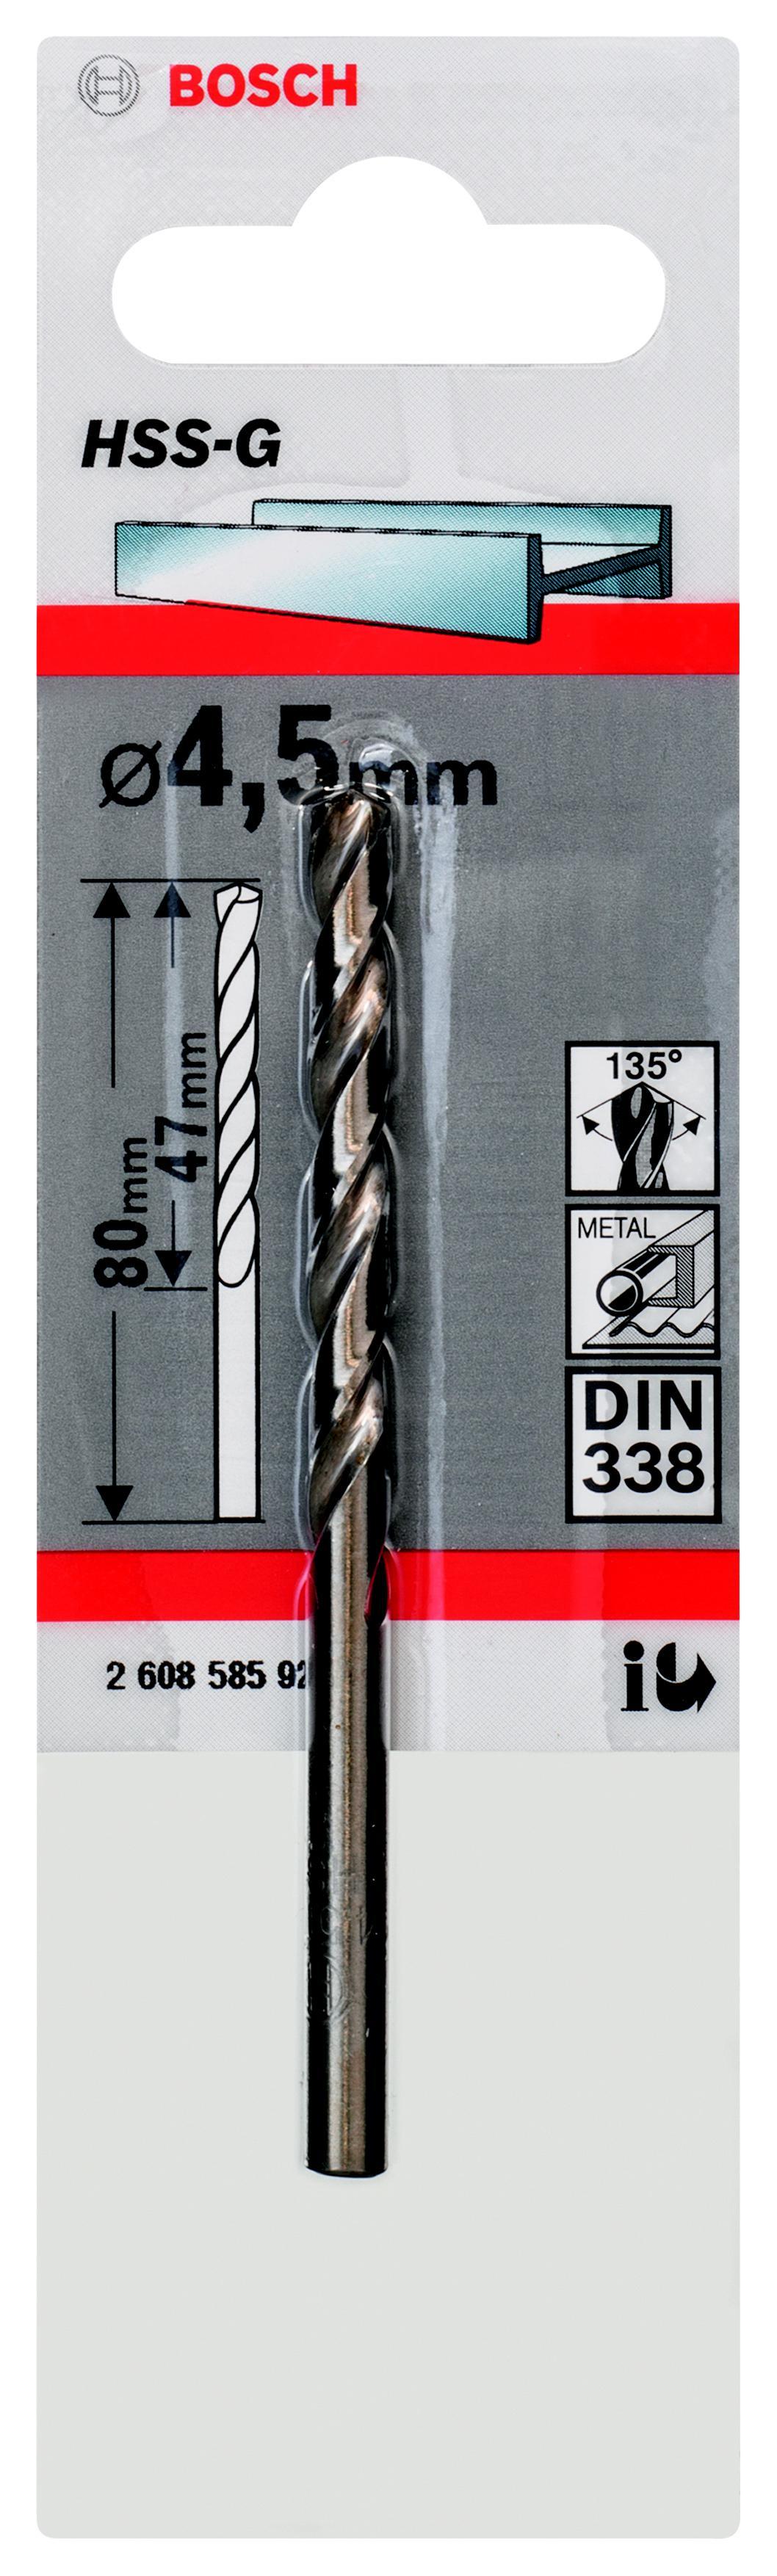 Сверло по металлу Bosch Hss-g standardline 4.5 мм (2.608.585.920) тиски механические bosch ms 80 g